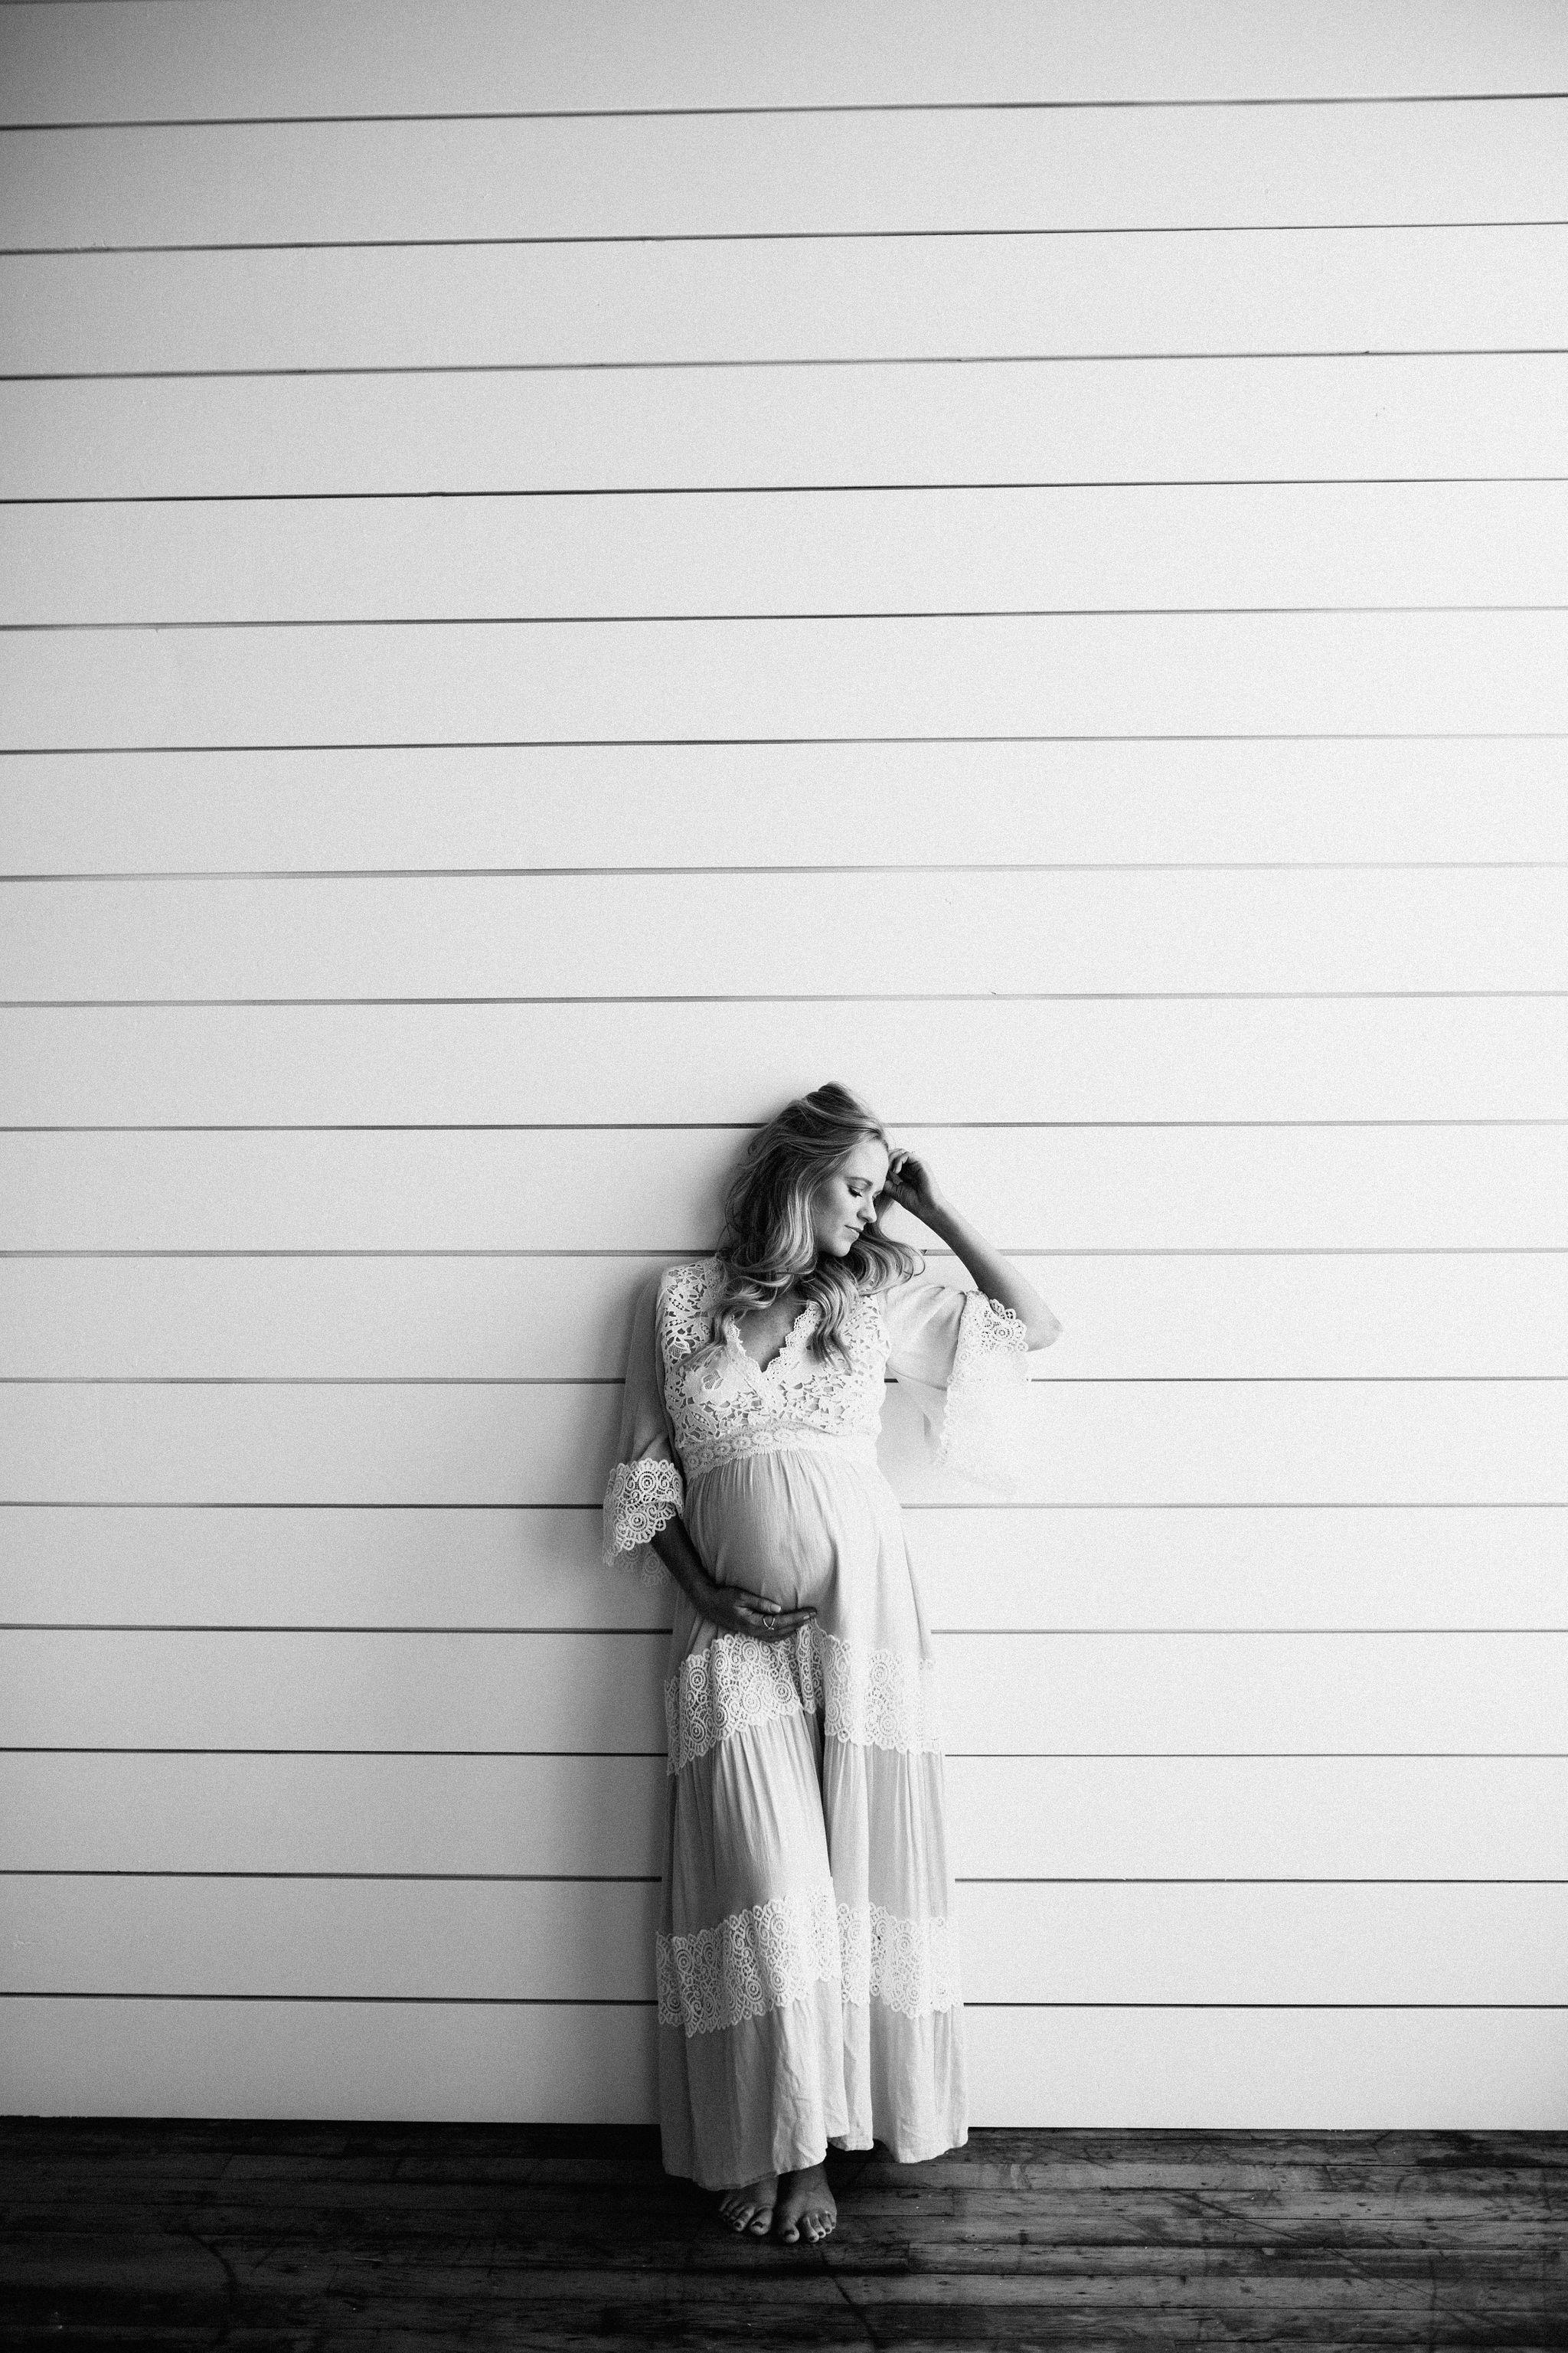 Katie-Posey-Maternity-Session-2018-Kansas-City-MO-Jesse-Salter-Photography-24.jpg